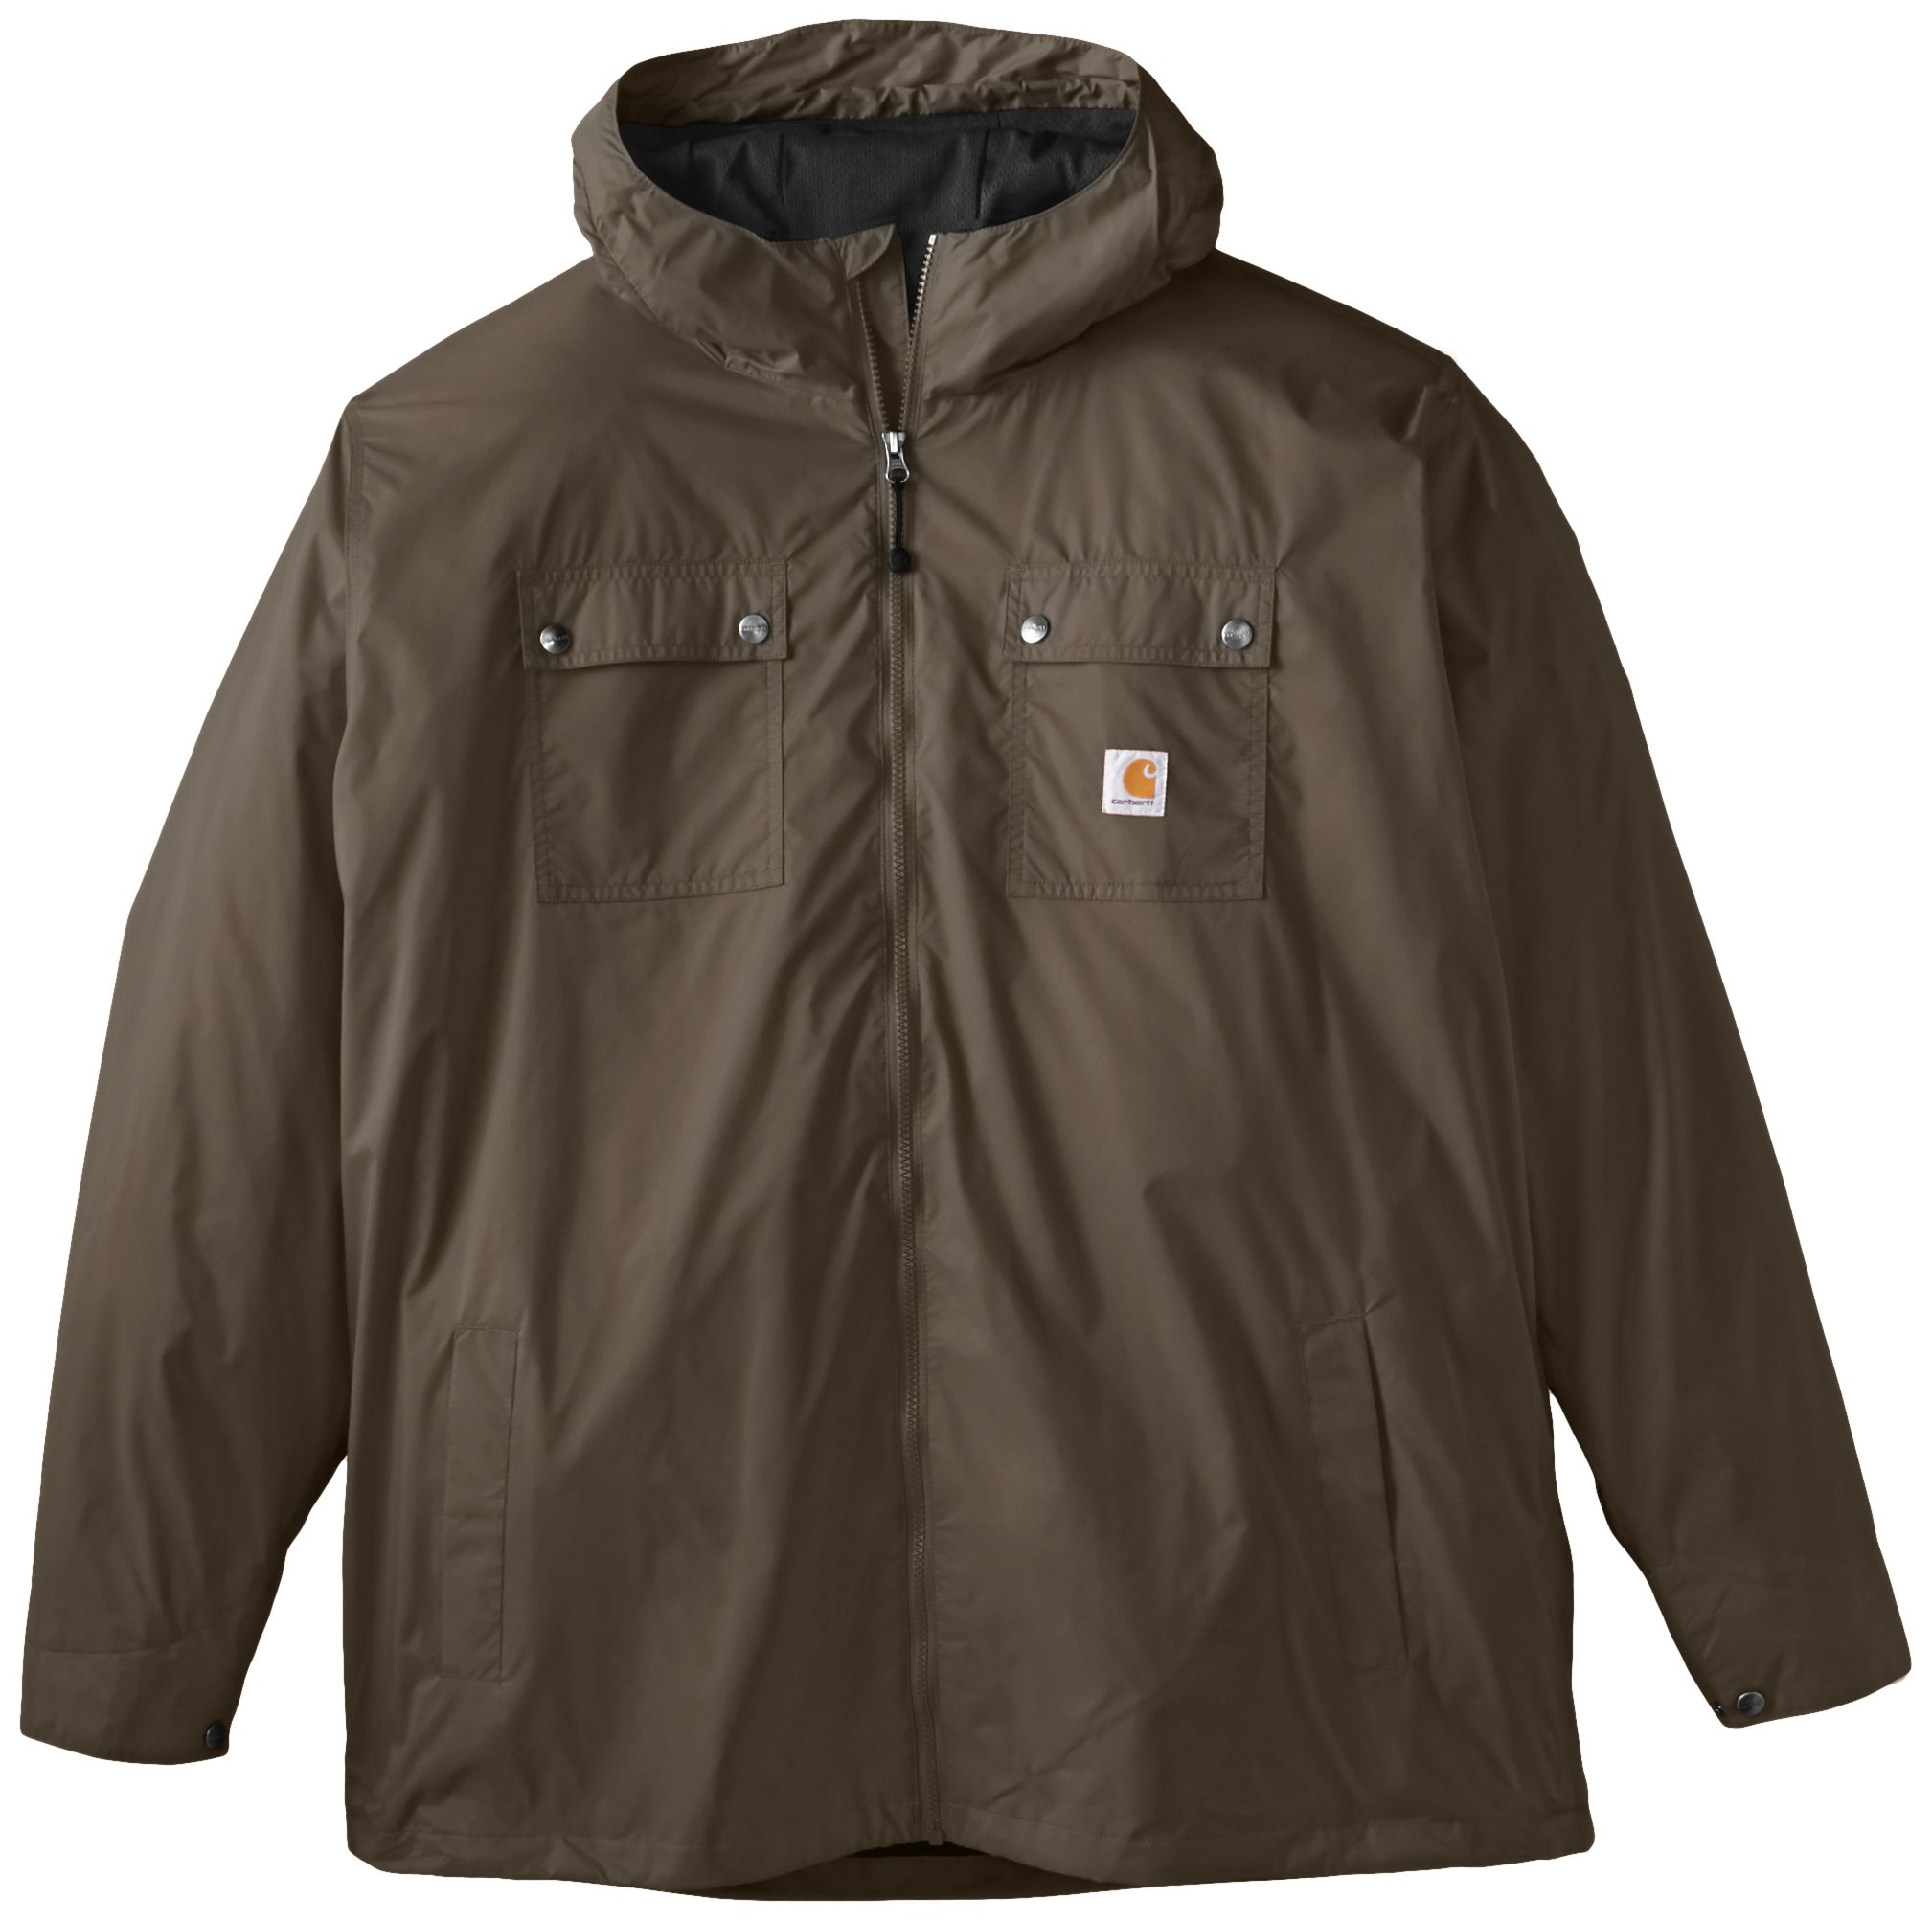 Carhartt Men's Big & Tall Rockford Rain Defender Jacket,Breen,XXX-Large Tall by Carhartt